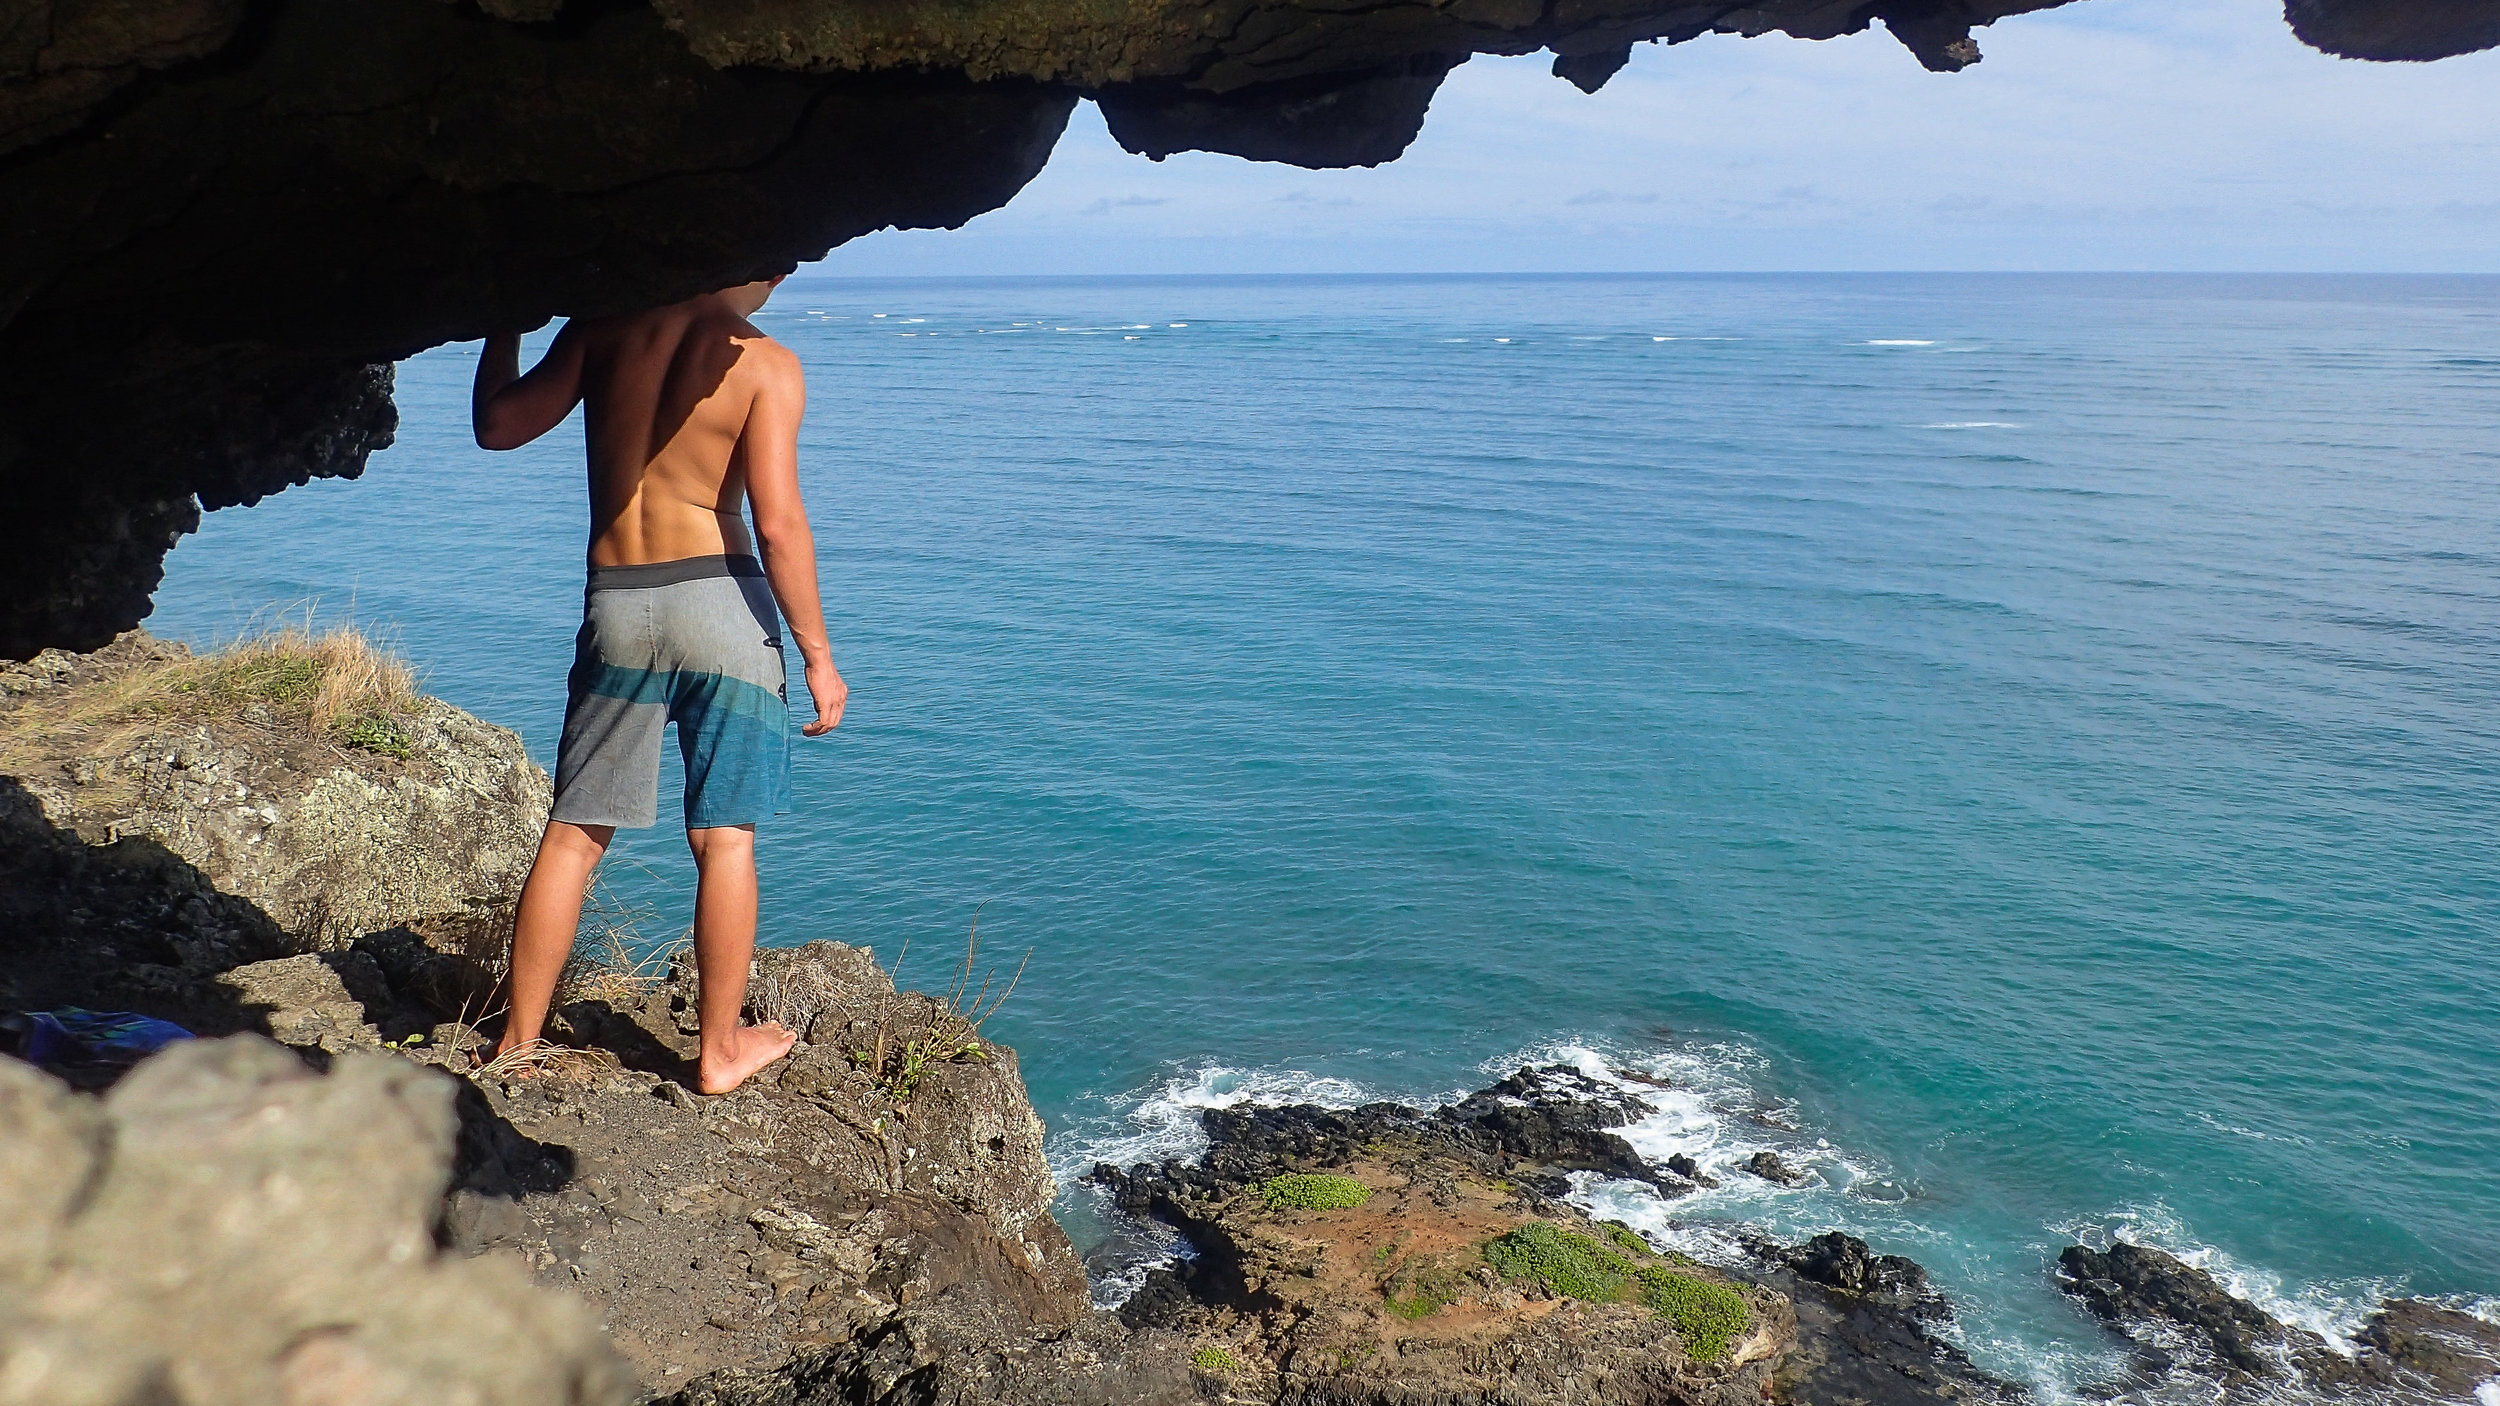 P_Tr_HI_Oahu_Olympus Images-316.jpg